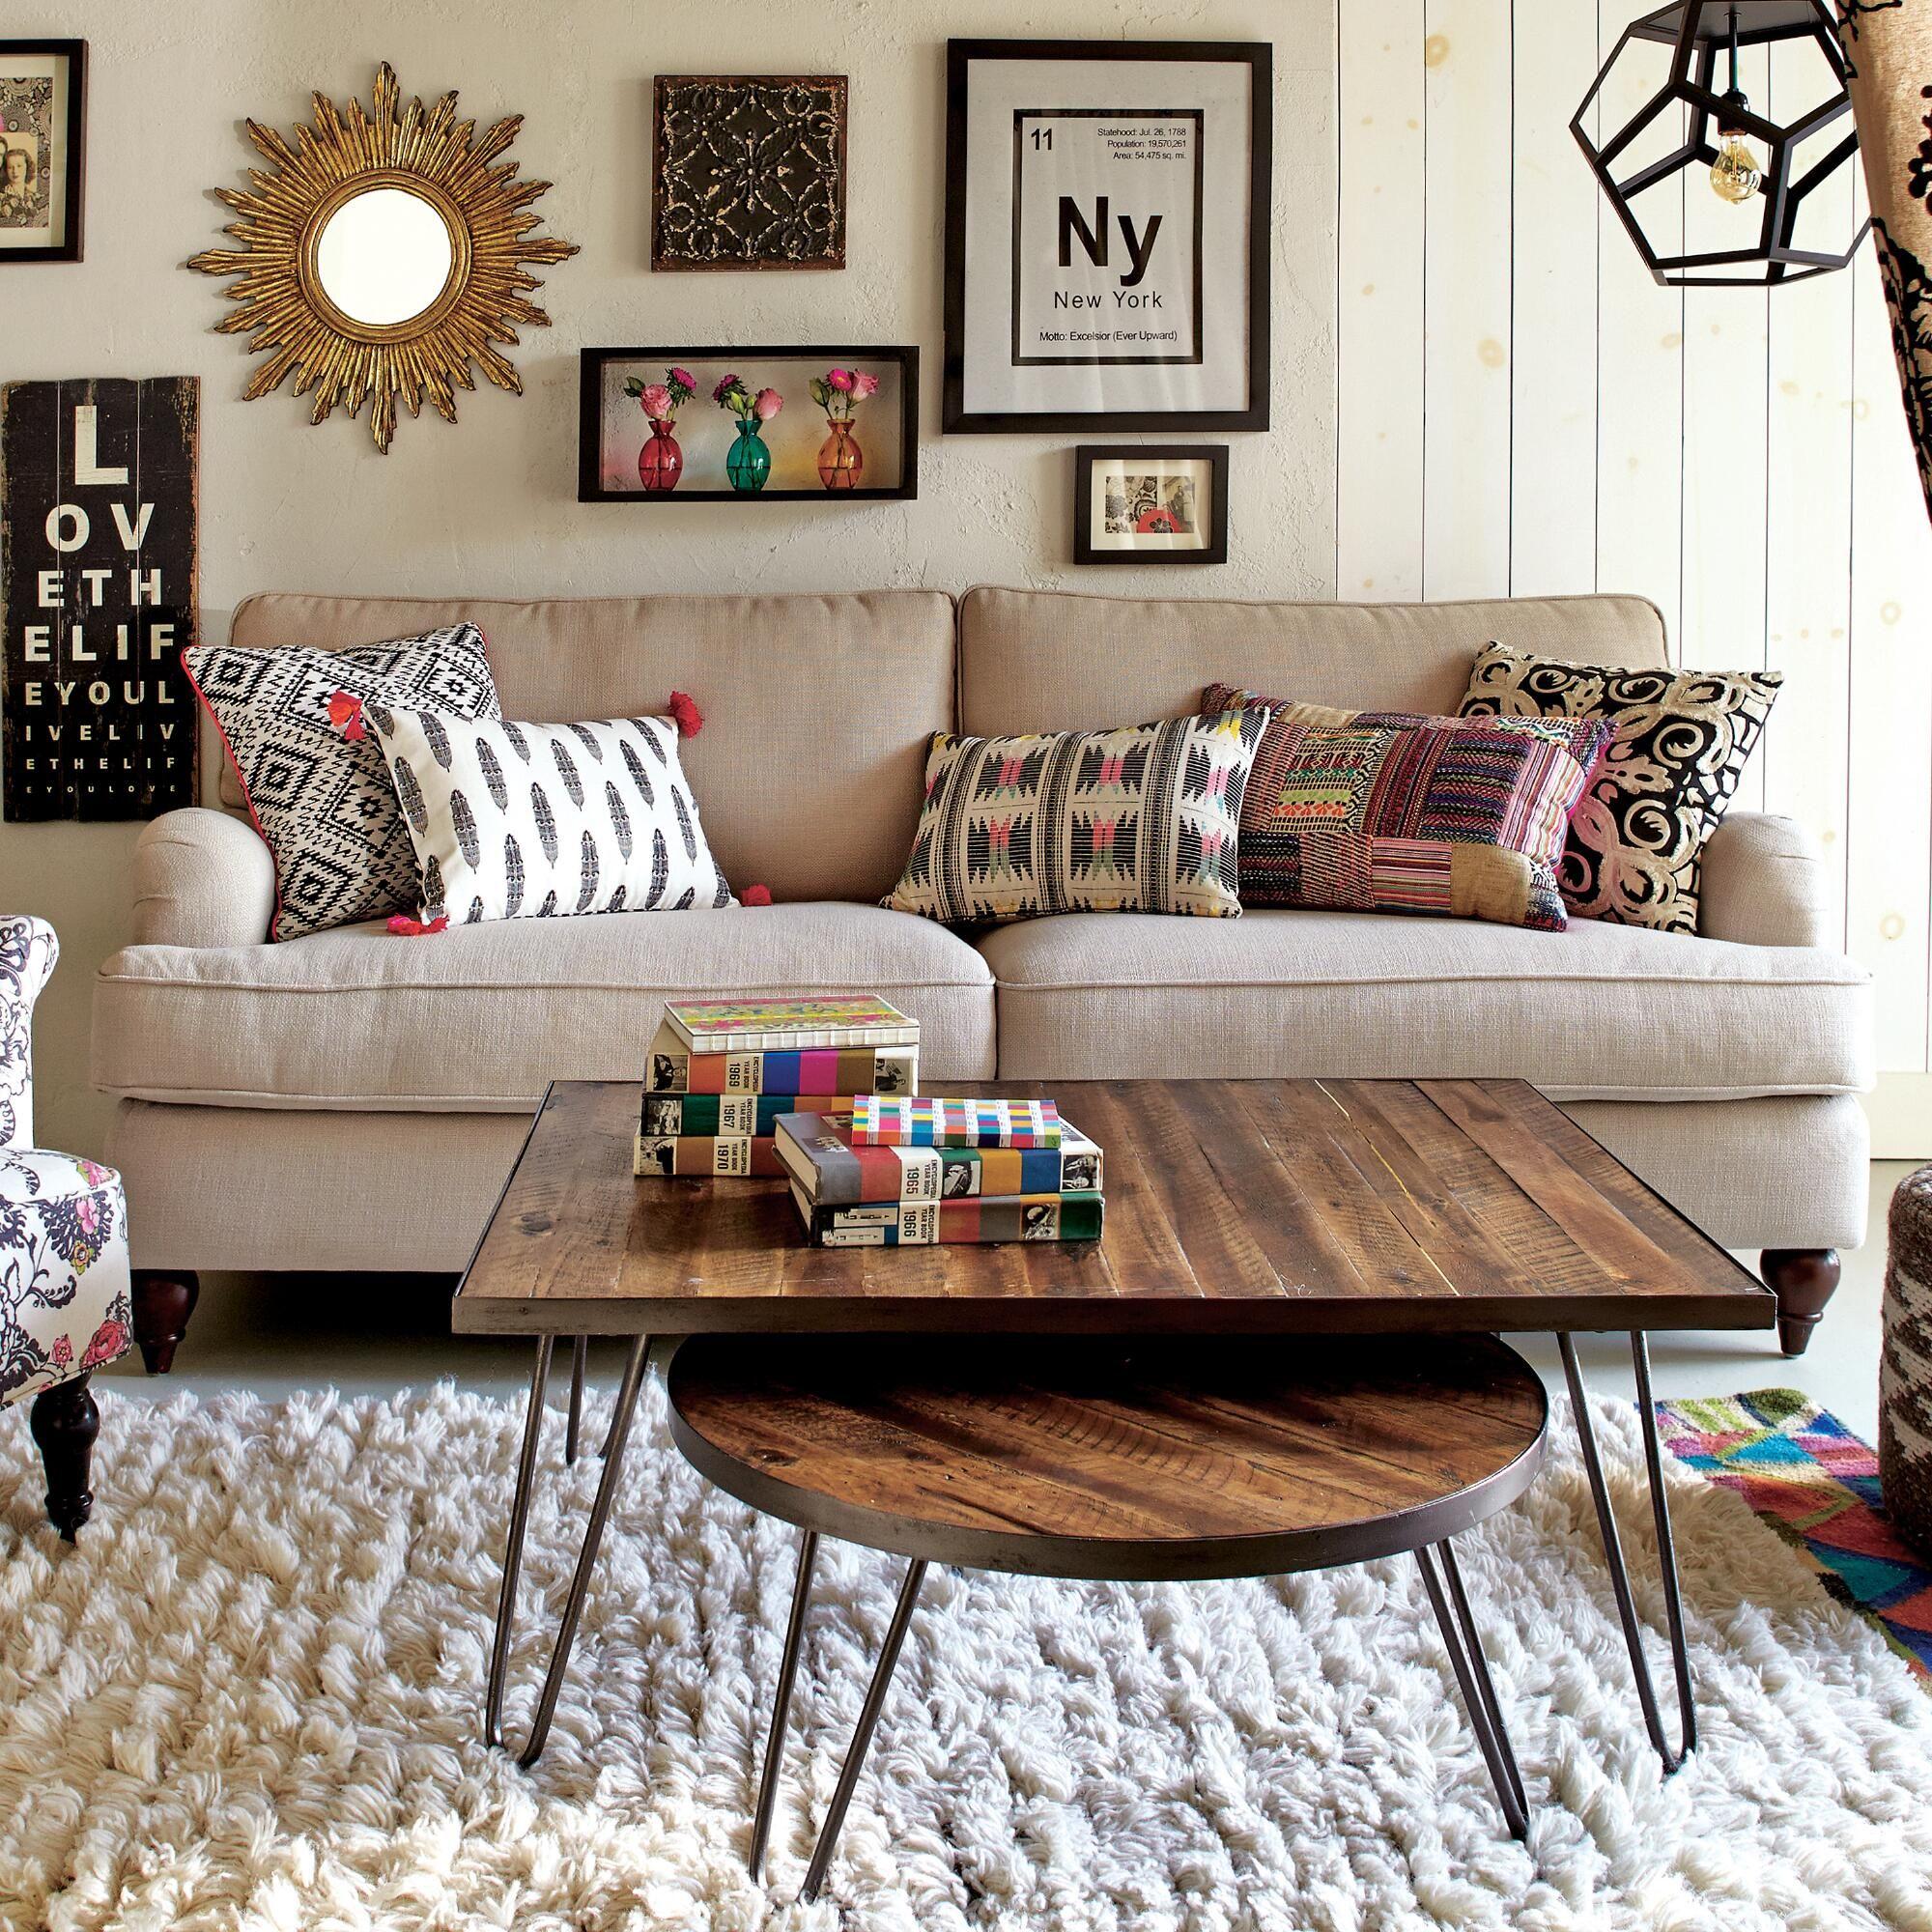 Borde de hierro de mesa redonda   Interiores   Pinterest   Mesa ...